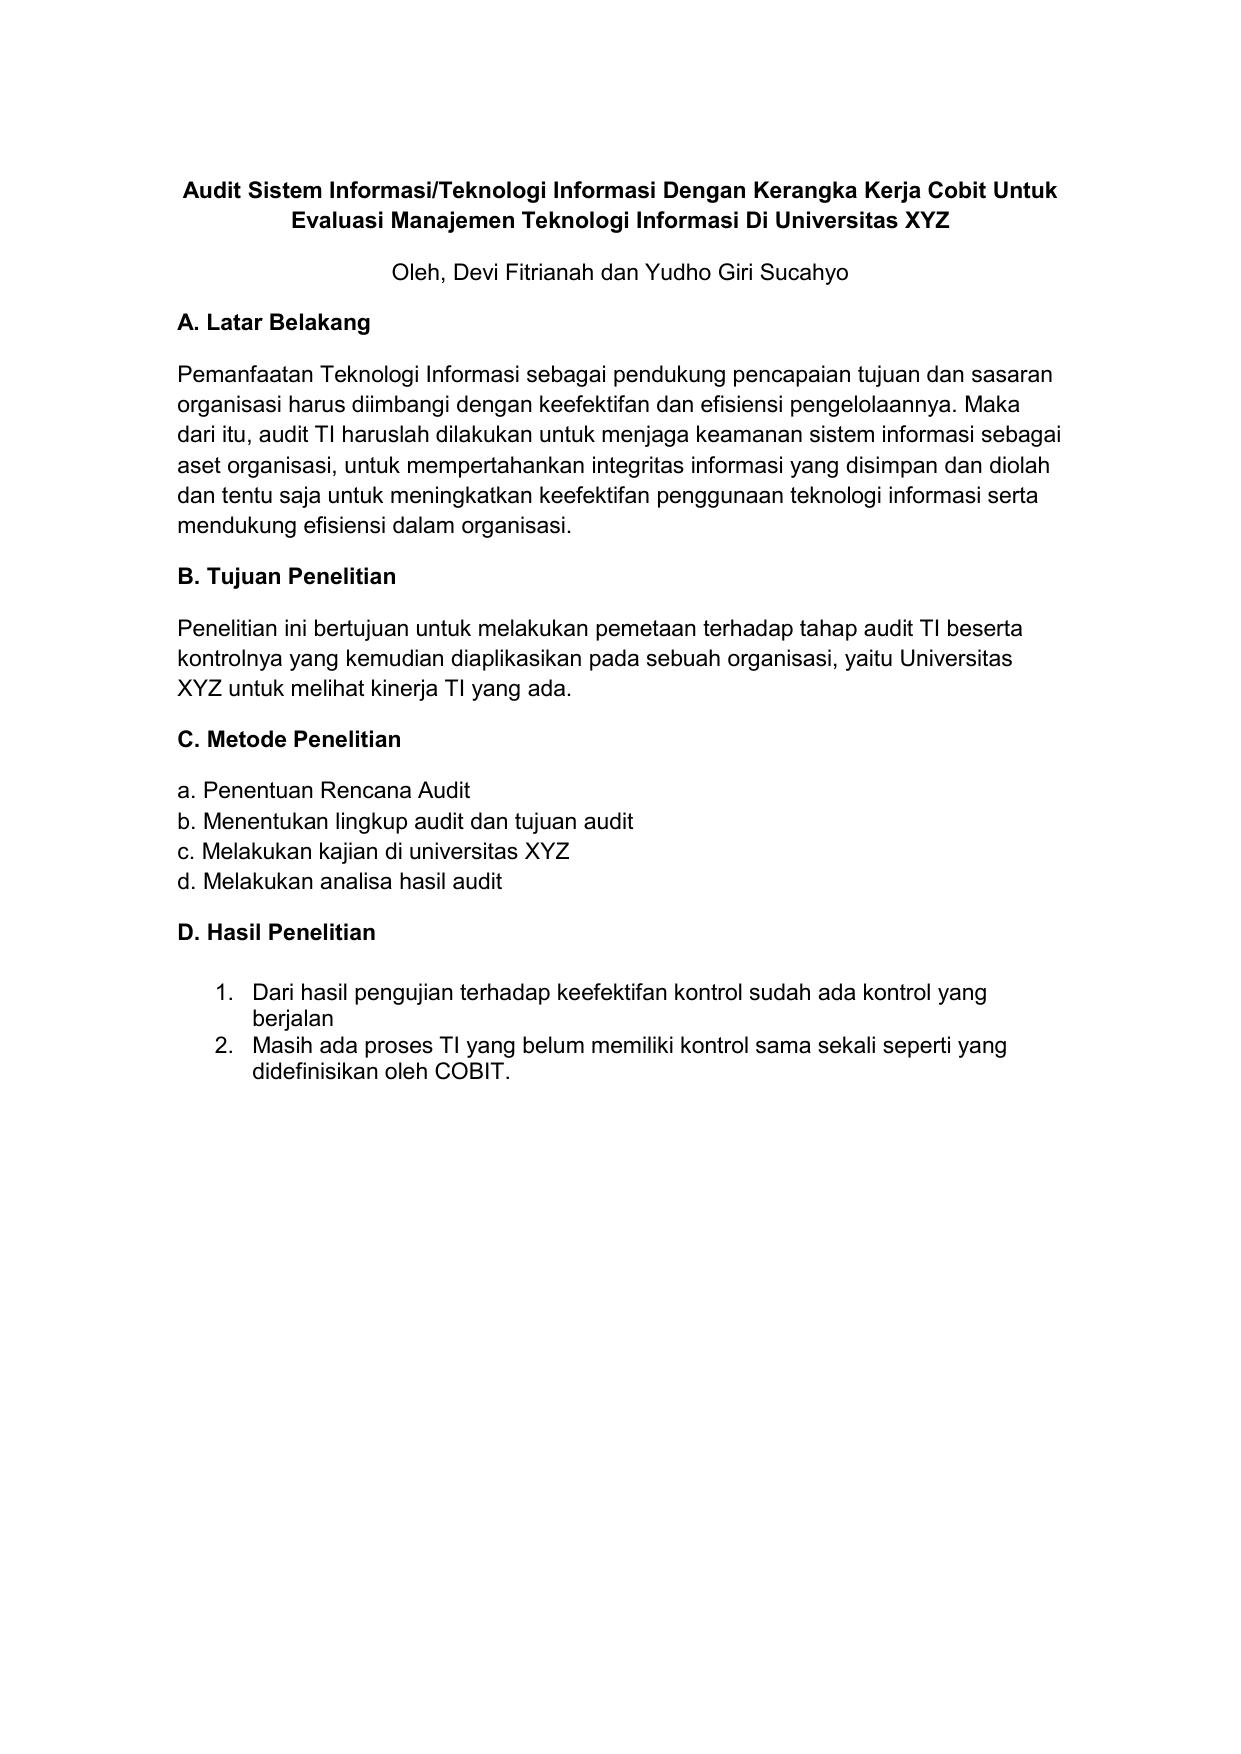 Ai C 13 Izza Zakiatul Ulya Review Jurnal Audit Sistem